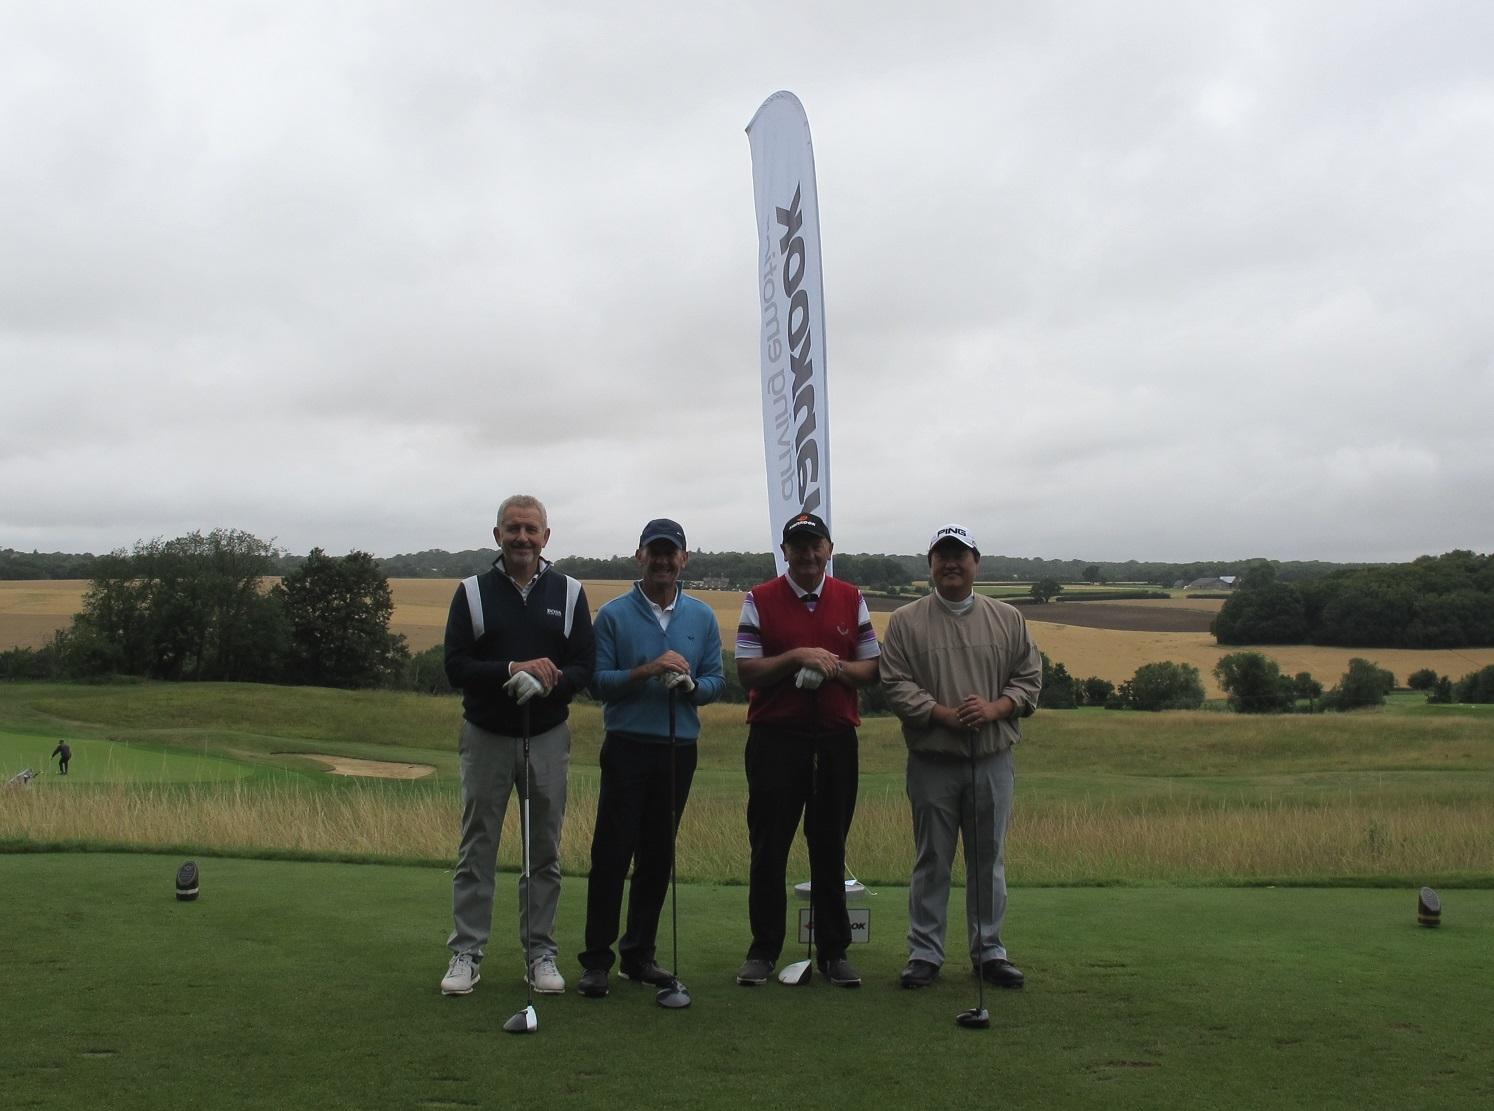 Jong Jin Park, Managing Director at Hankook Tyre UK (far right) at the Hankook Golf Classic